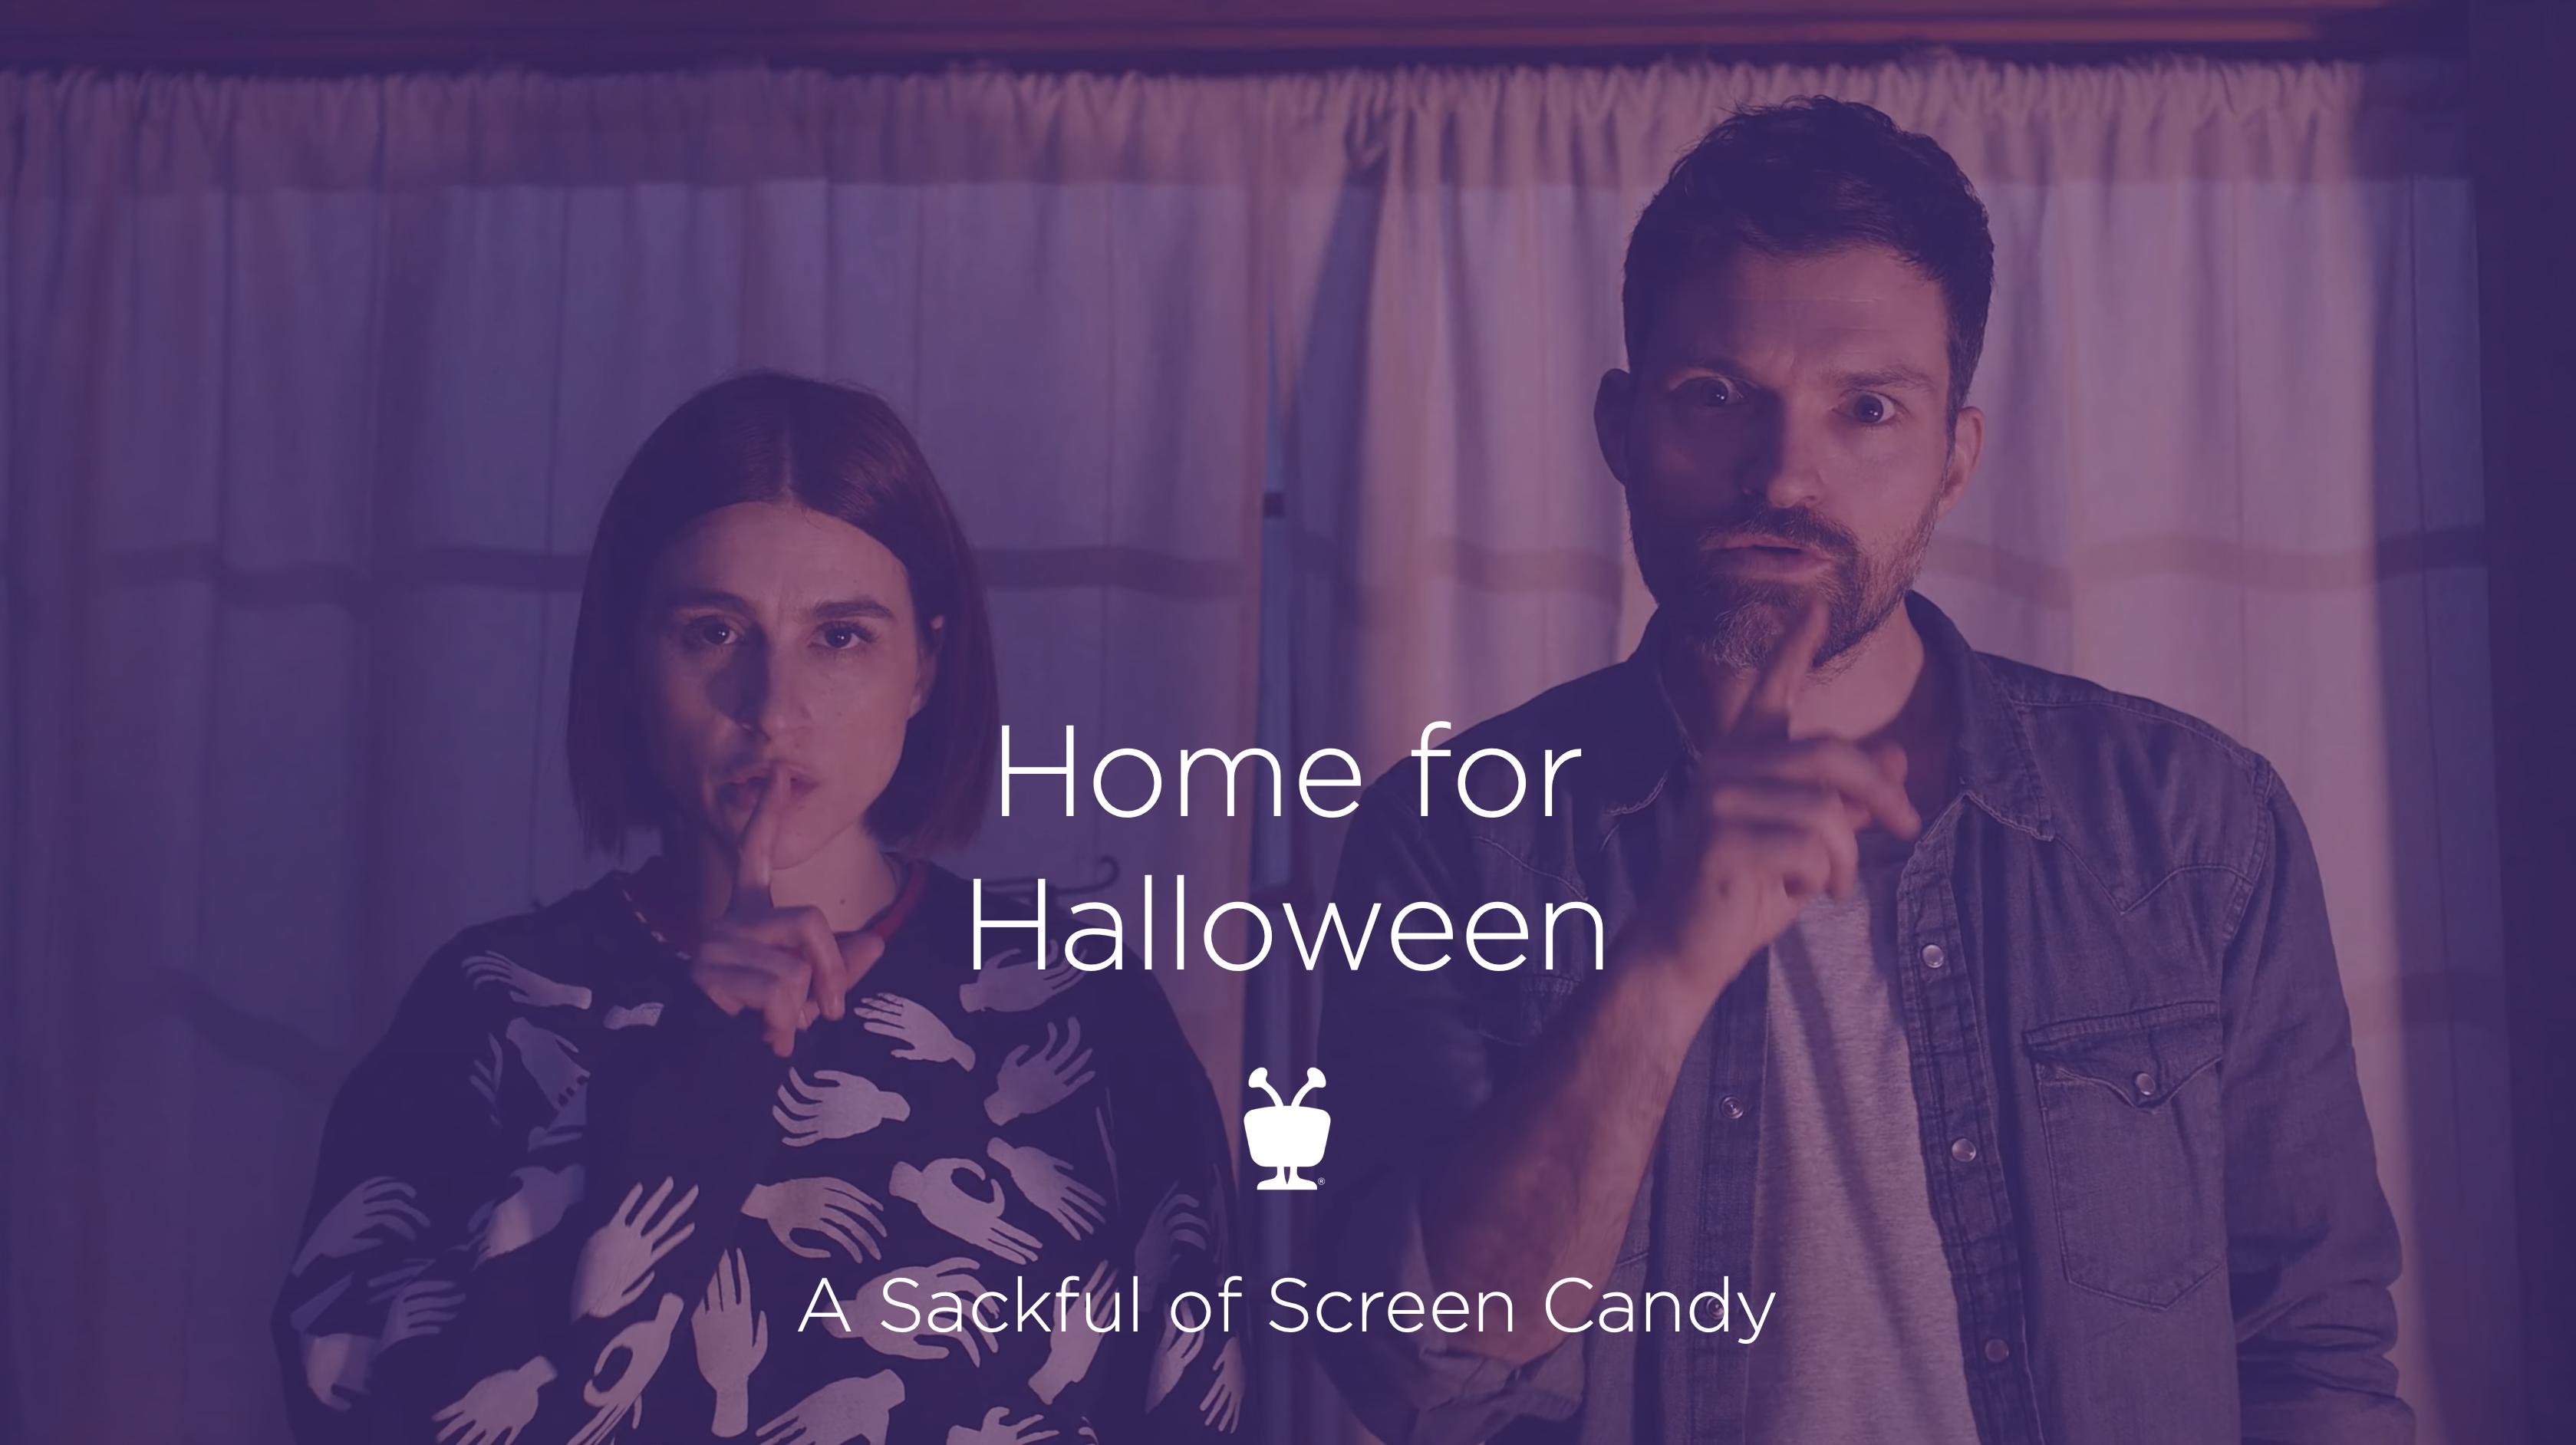 Halloween 2020 Streaming Vo A Sackful of Screen Candy: Home for Halloween – TiVo Blog